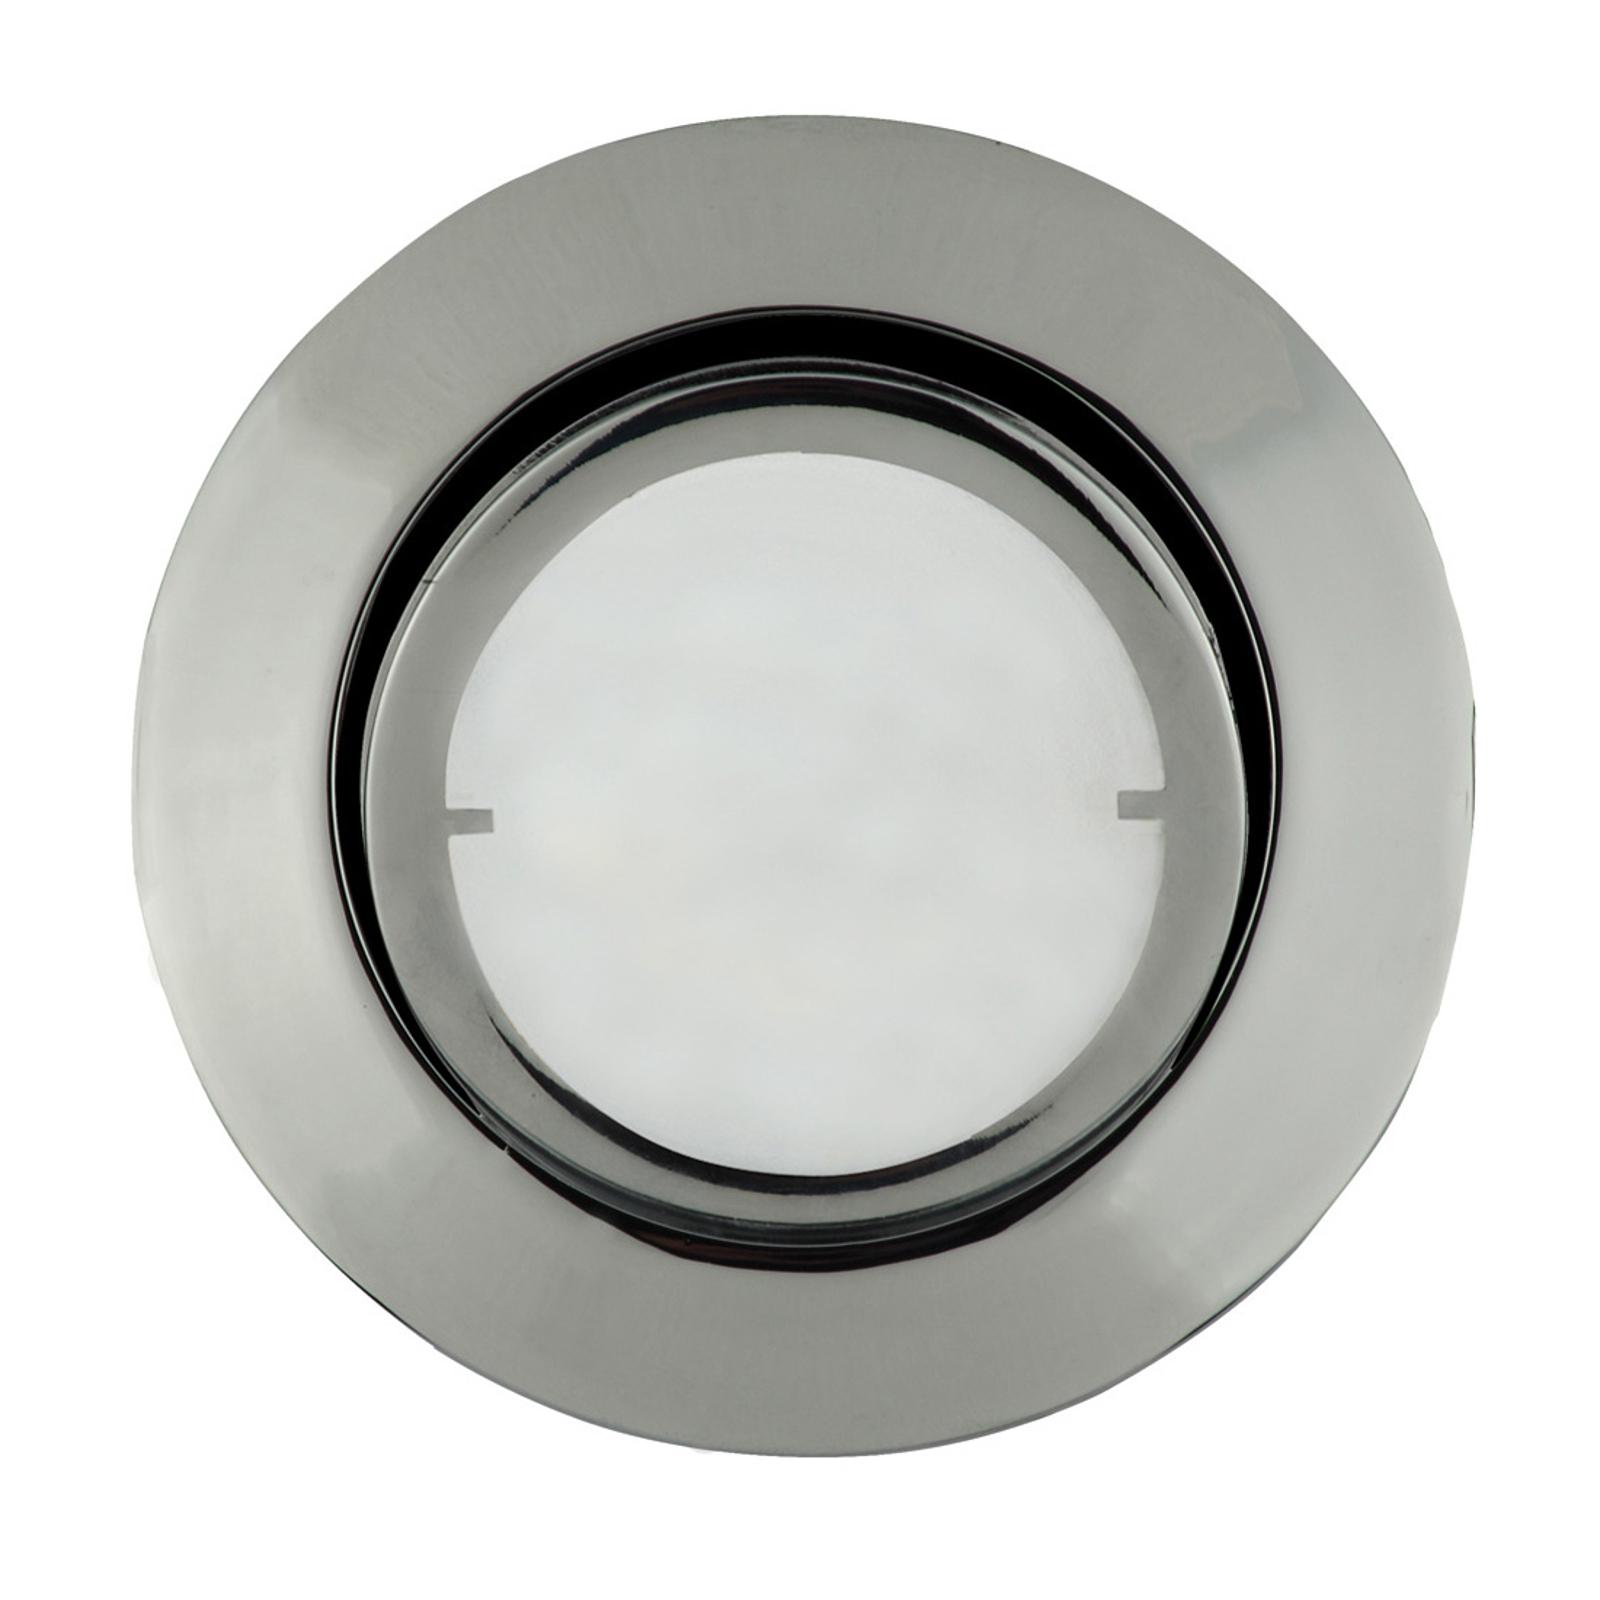 Spot LED incasso Joanie rotondo, cromo